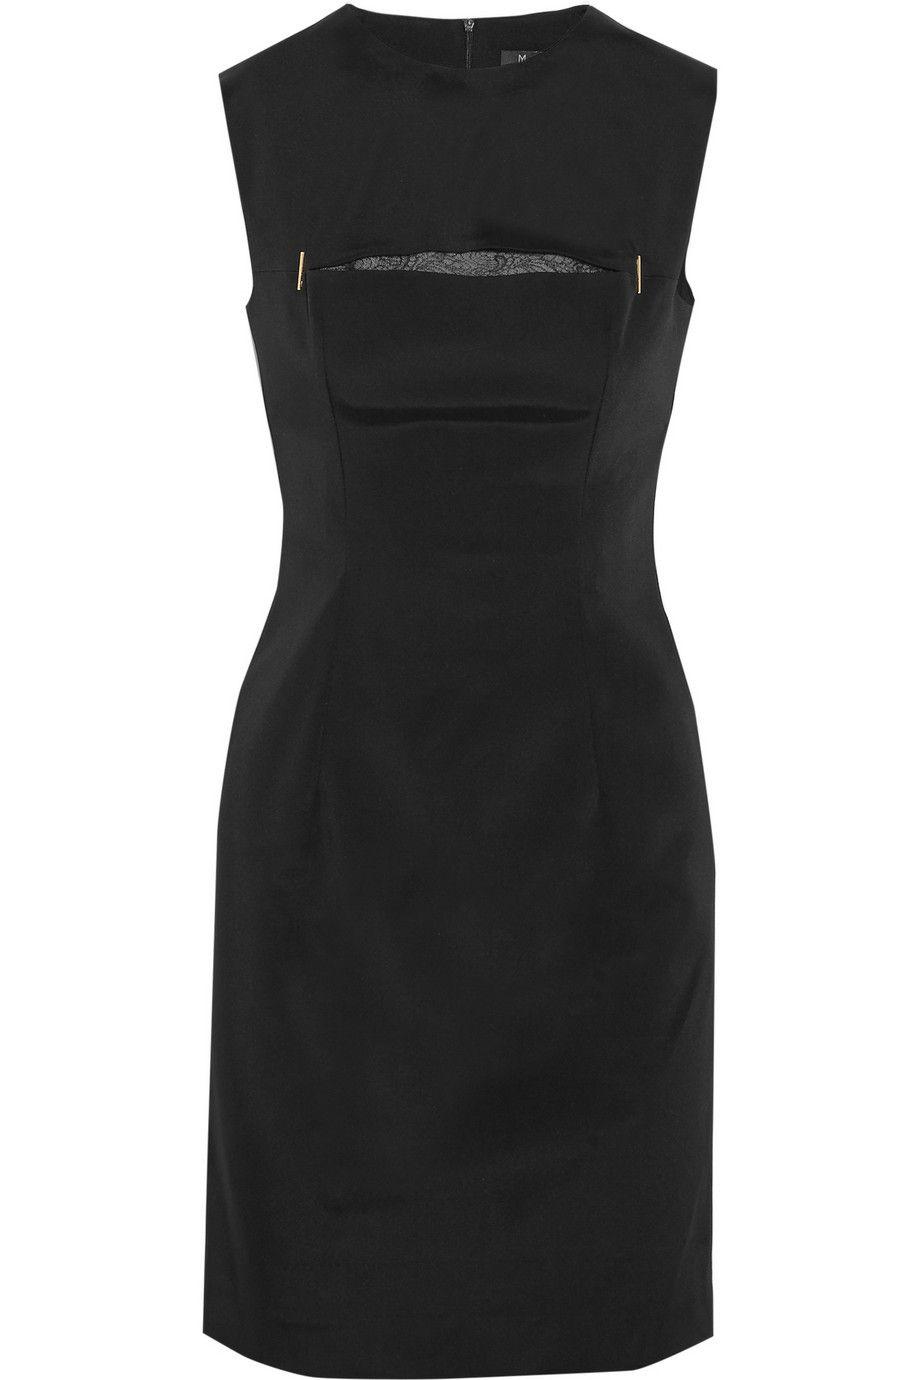 Slit-front crepe dress | Marios Schwab | 50% off | THE OUTNET